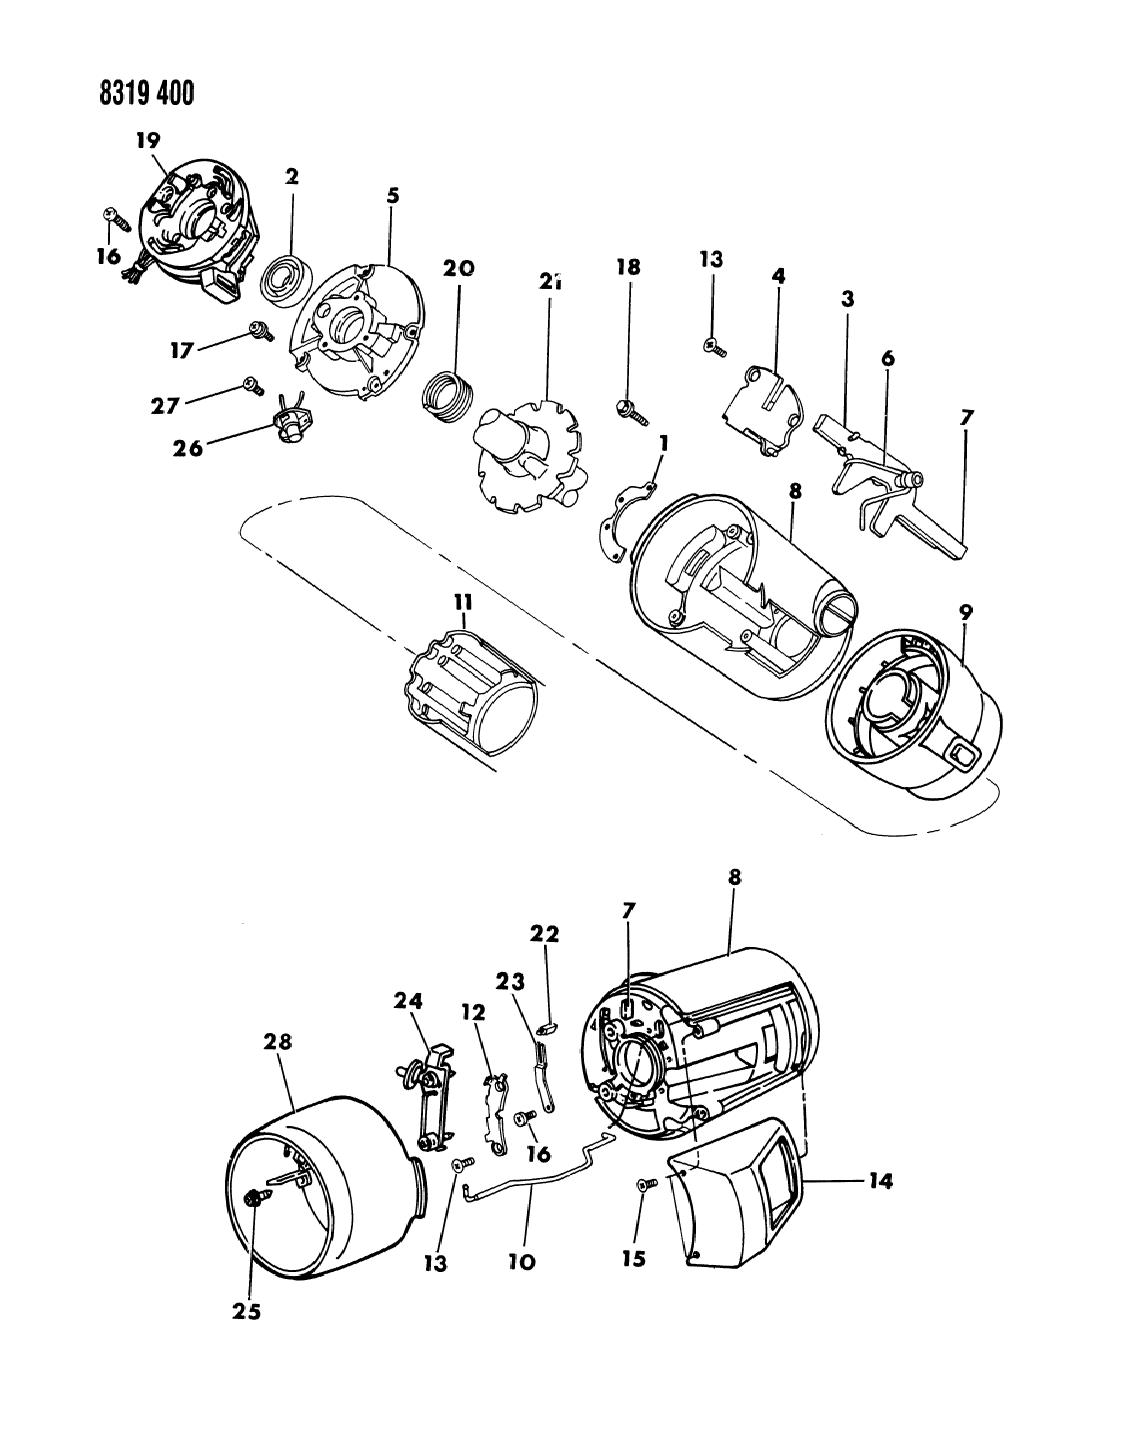 1989 dodge dakota column, steering without tilt upper1989 Dodge Dakota Steering Column Diagram #2